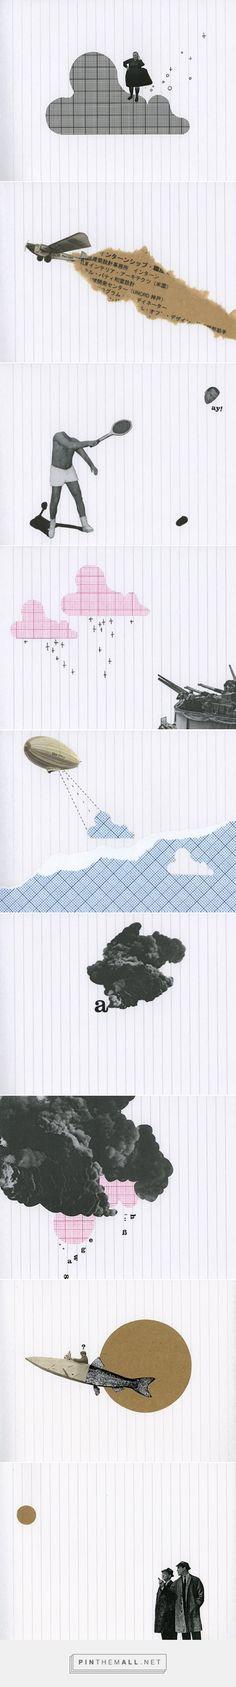 ARTE: I collage su notebook di Raúl Lázaro - Osso Magazine - created via http://pinthemall.net